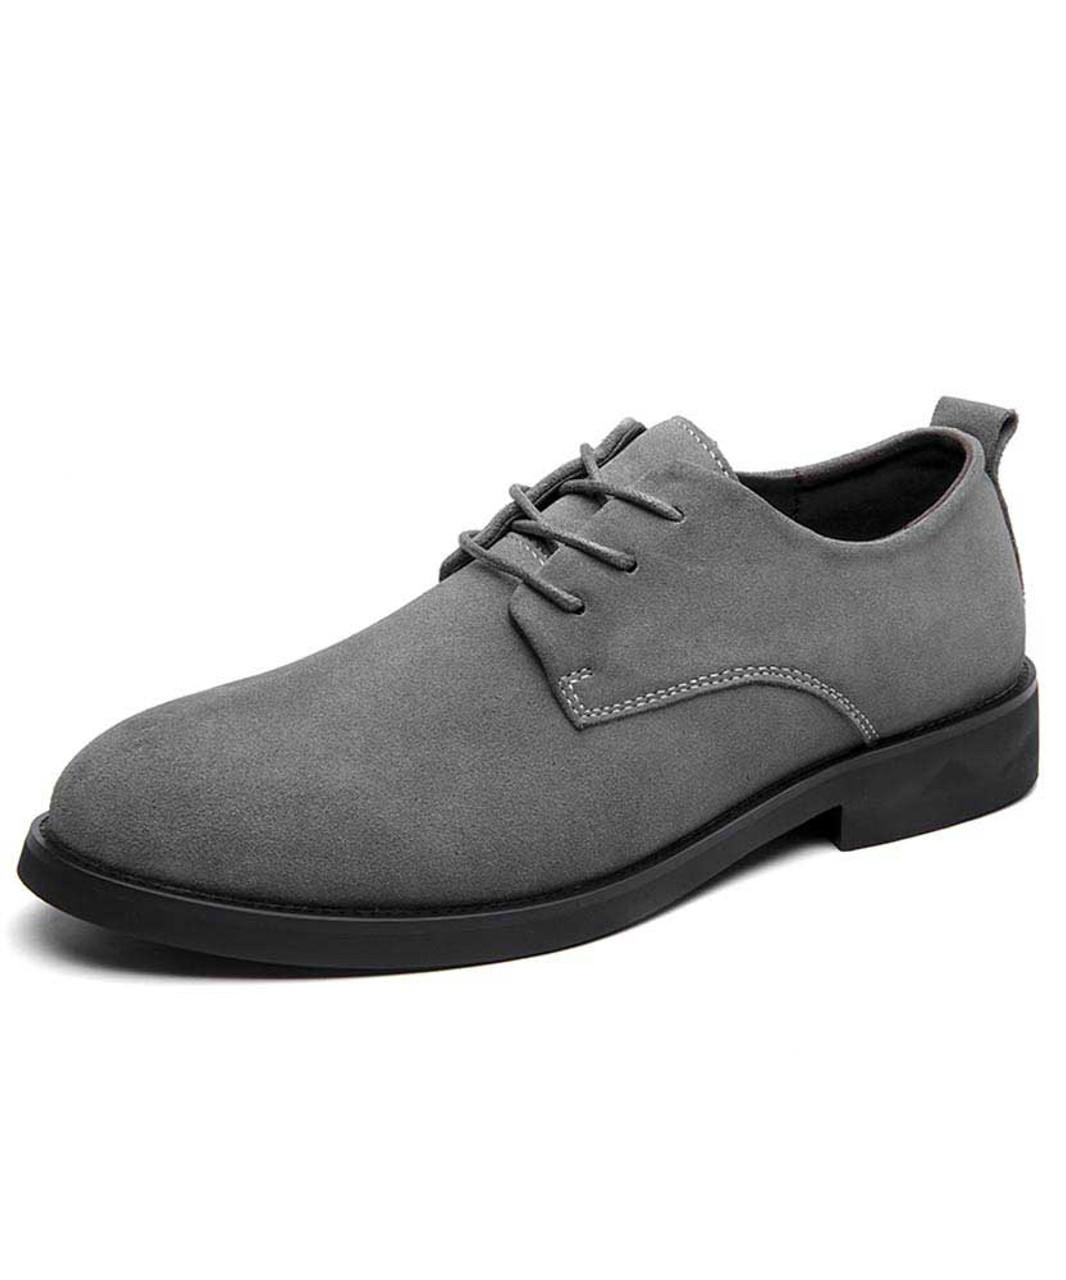 Grey suede leather derby dress shoe